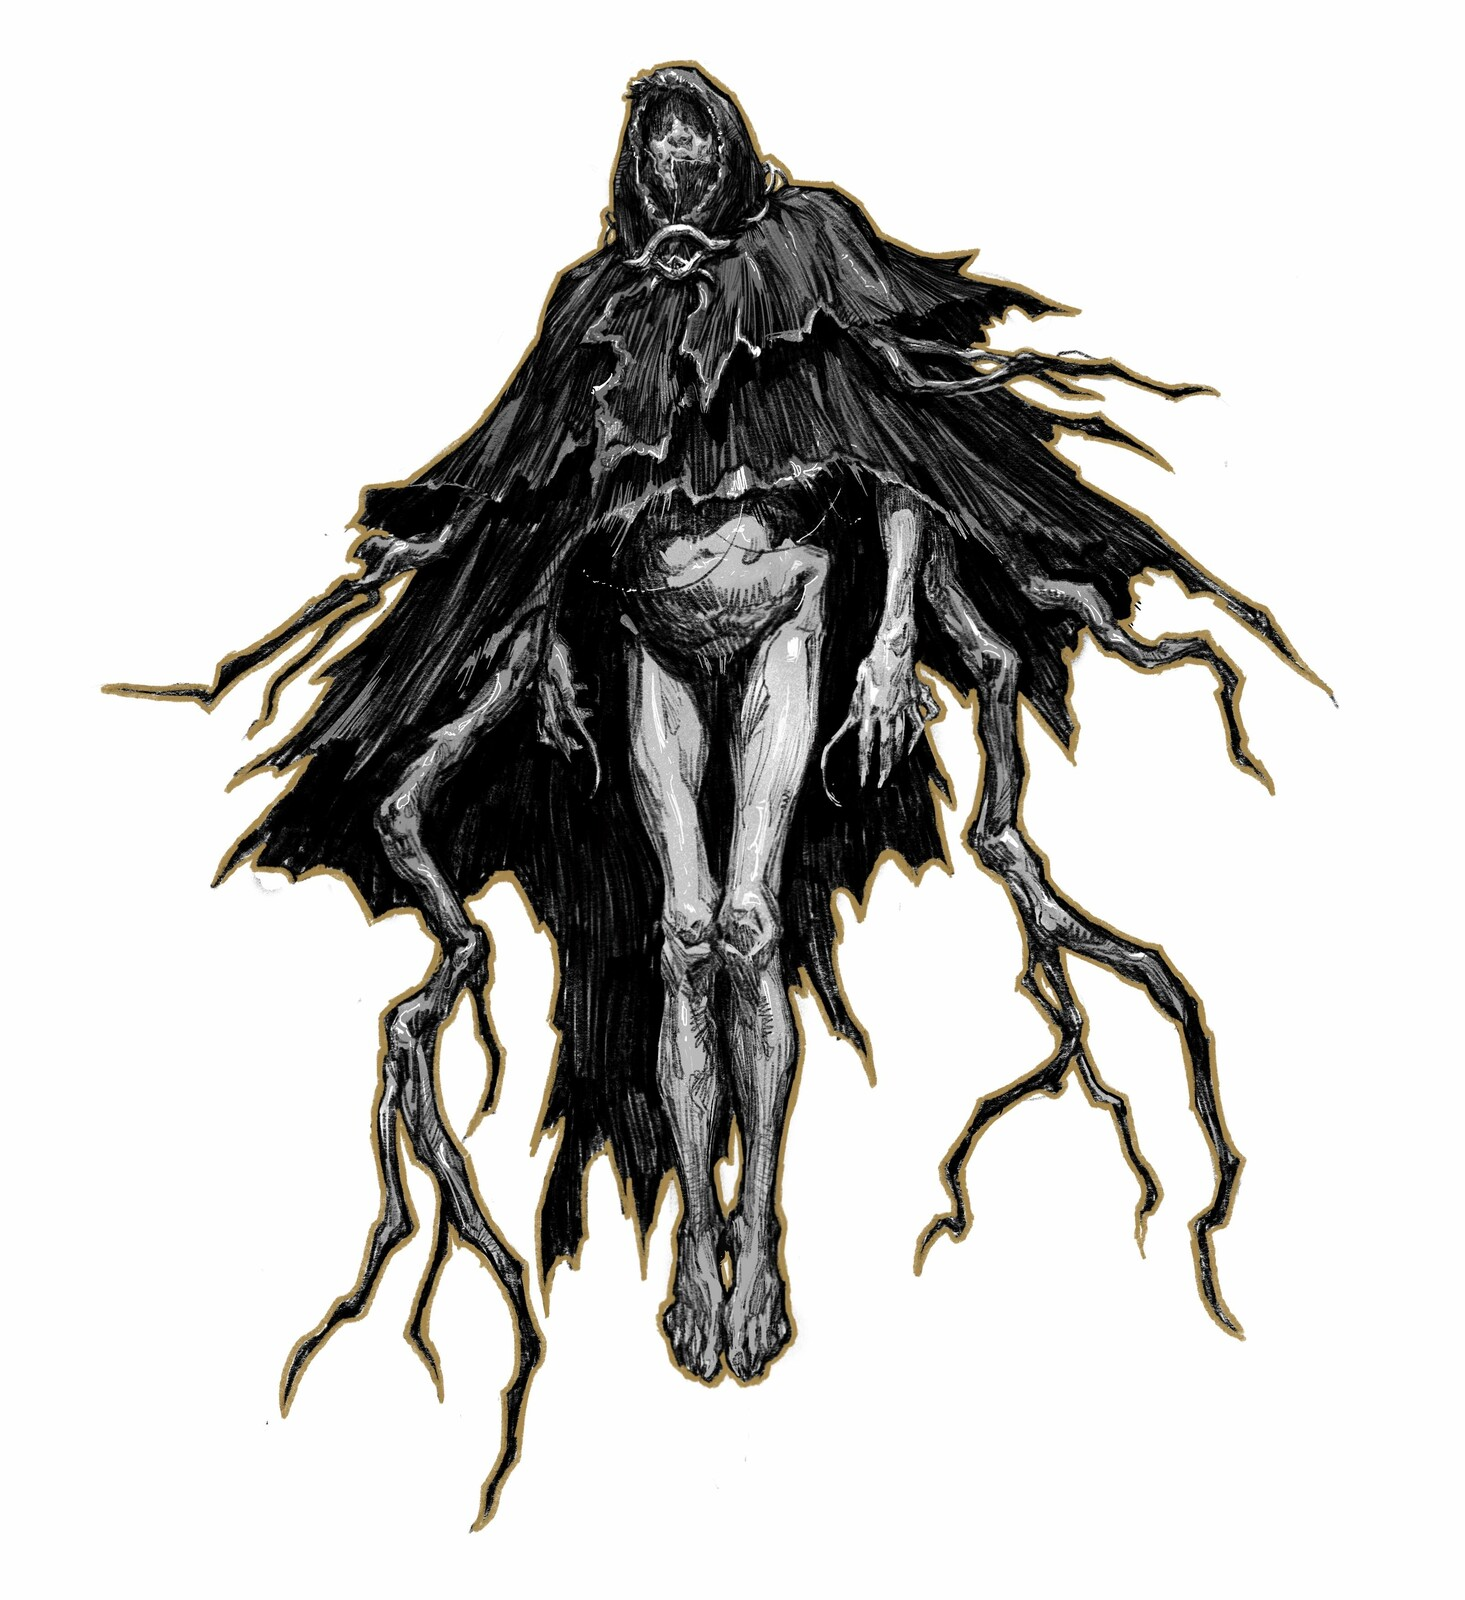 Shub-Niggurath follower /1